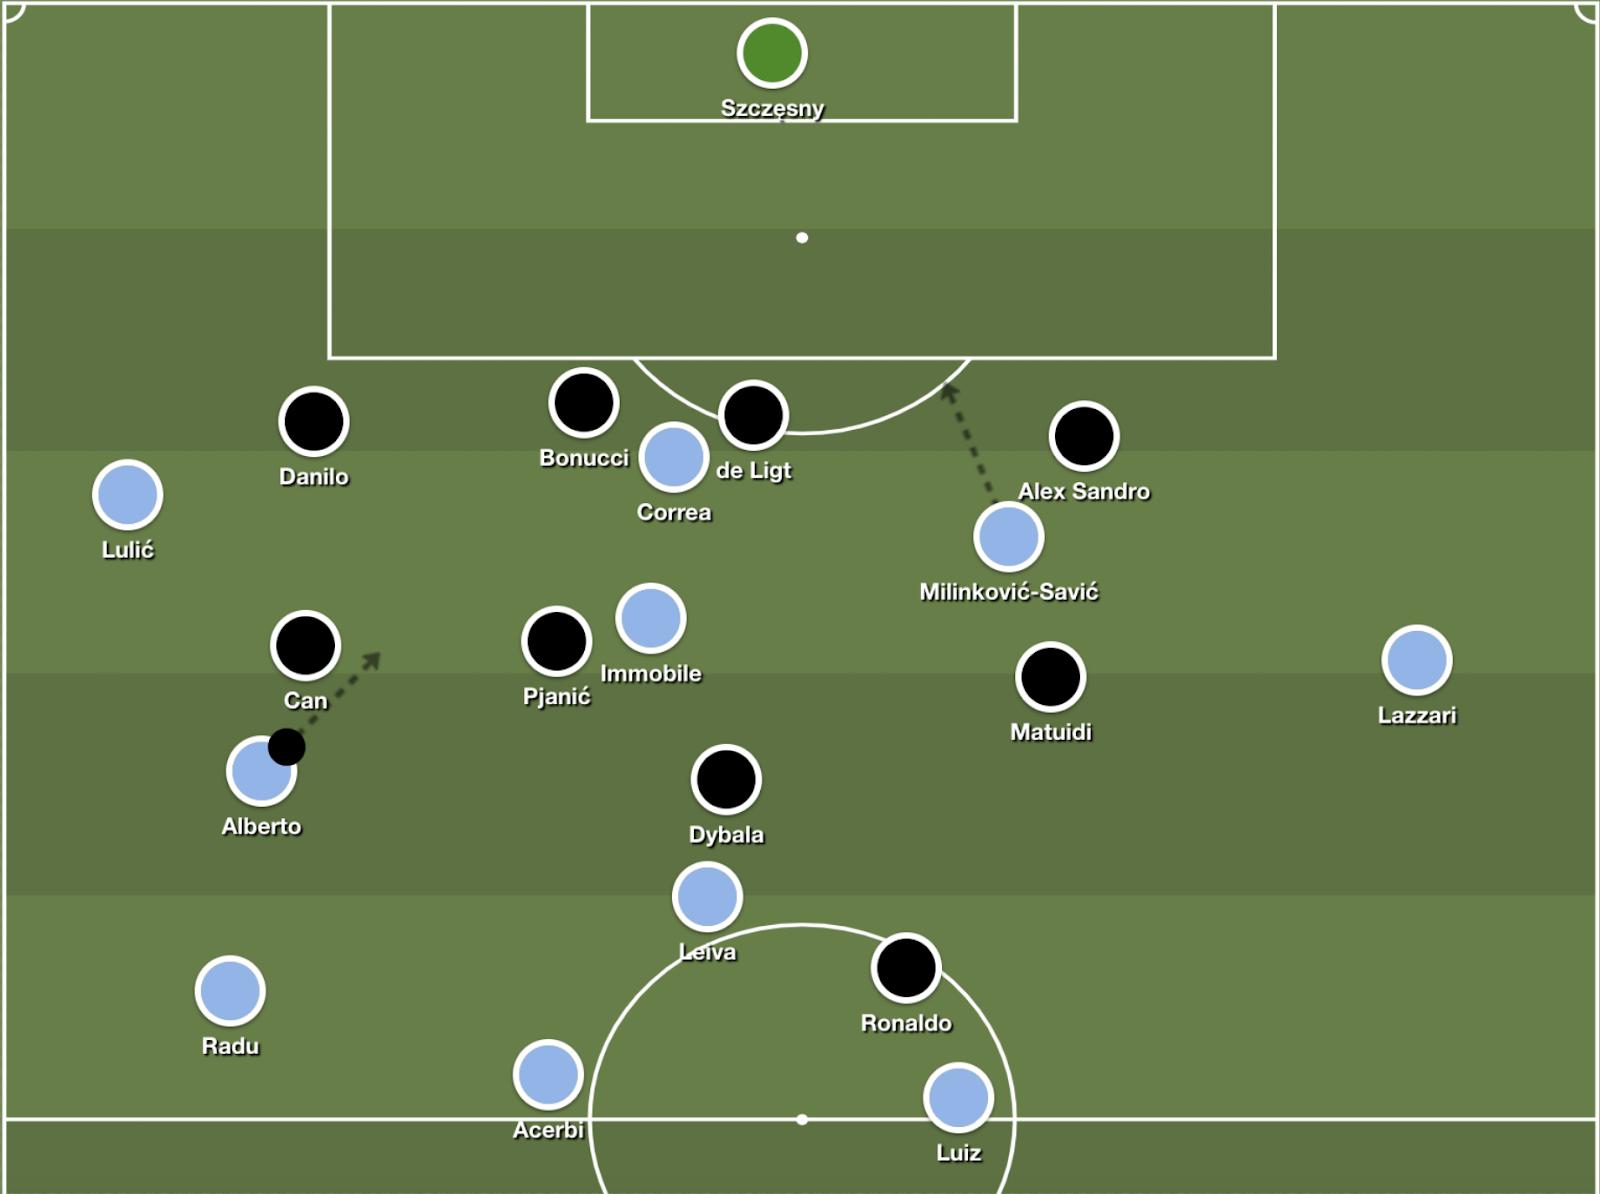 Setup for Milinković-Savić's goal on the diagonal.